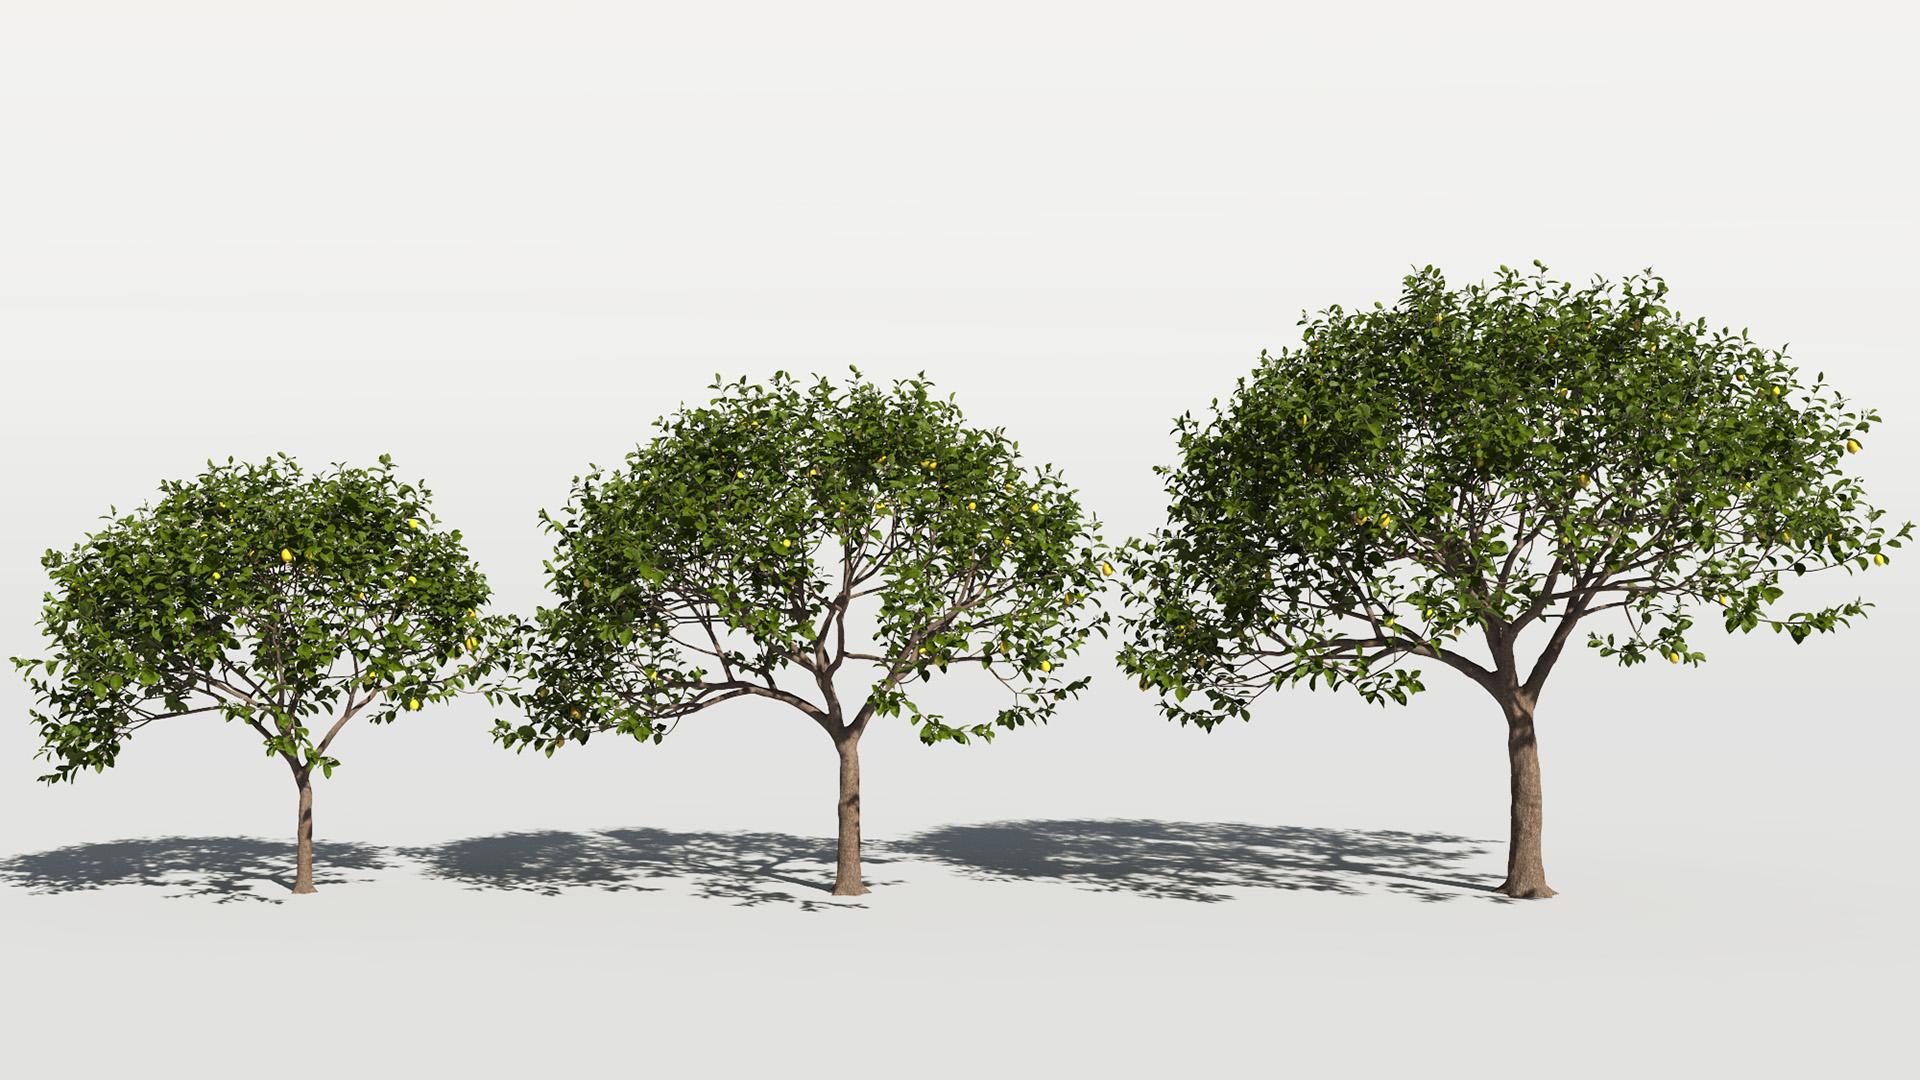 3D model of the Lemon tree Citrus x limon maturity variations